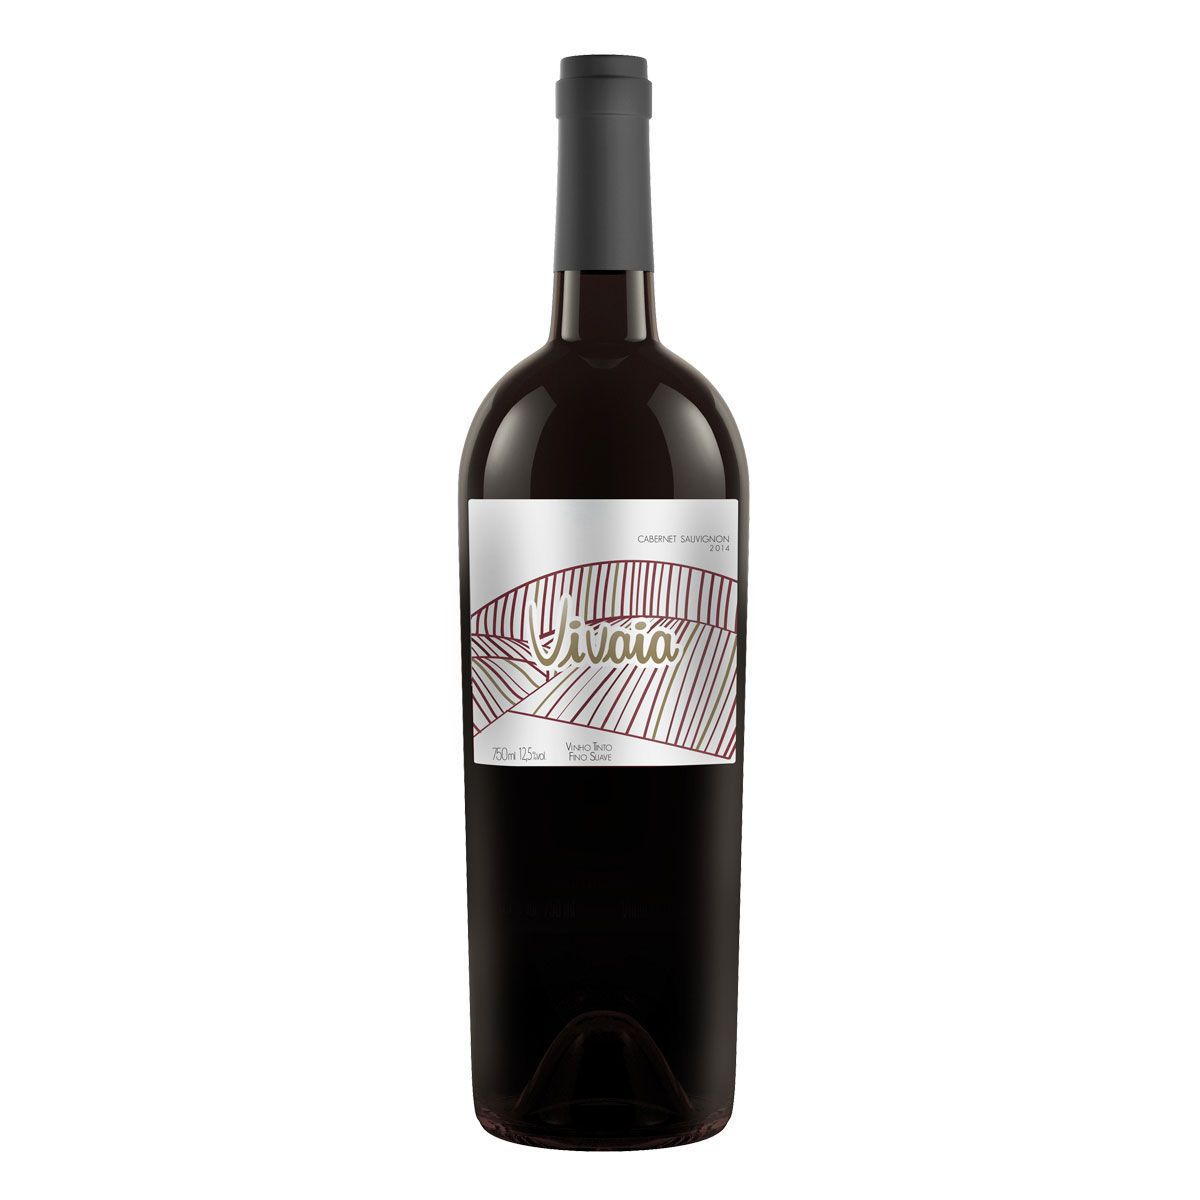 Vinho Fino Tinto Suave Pericó Vivaia 2014 750ml